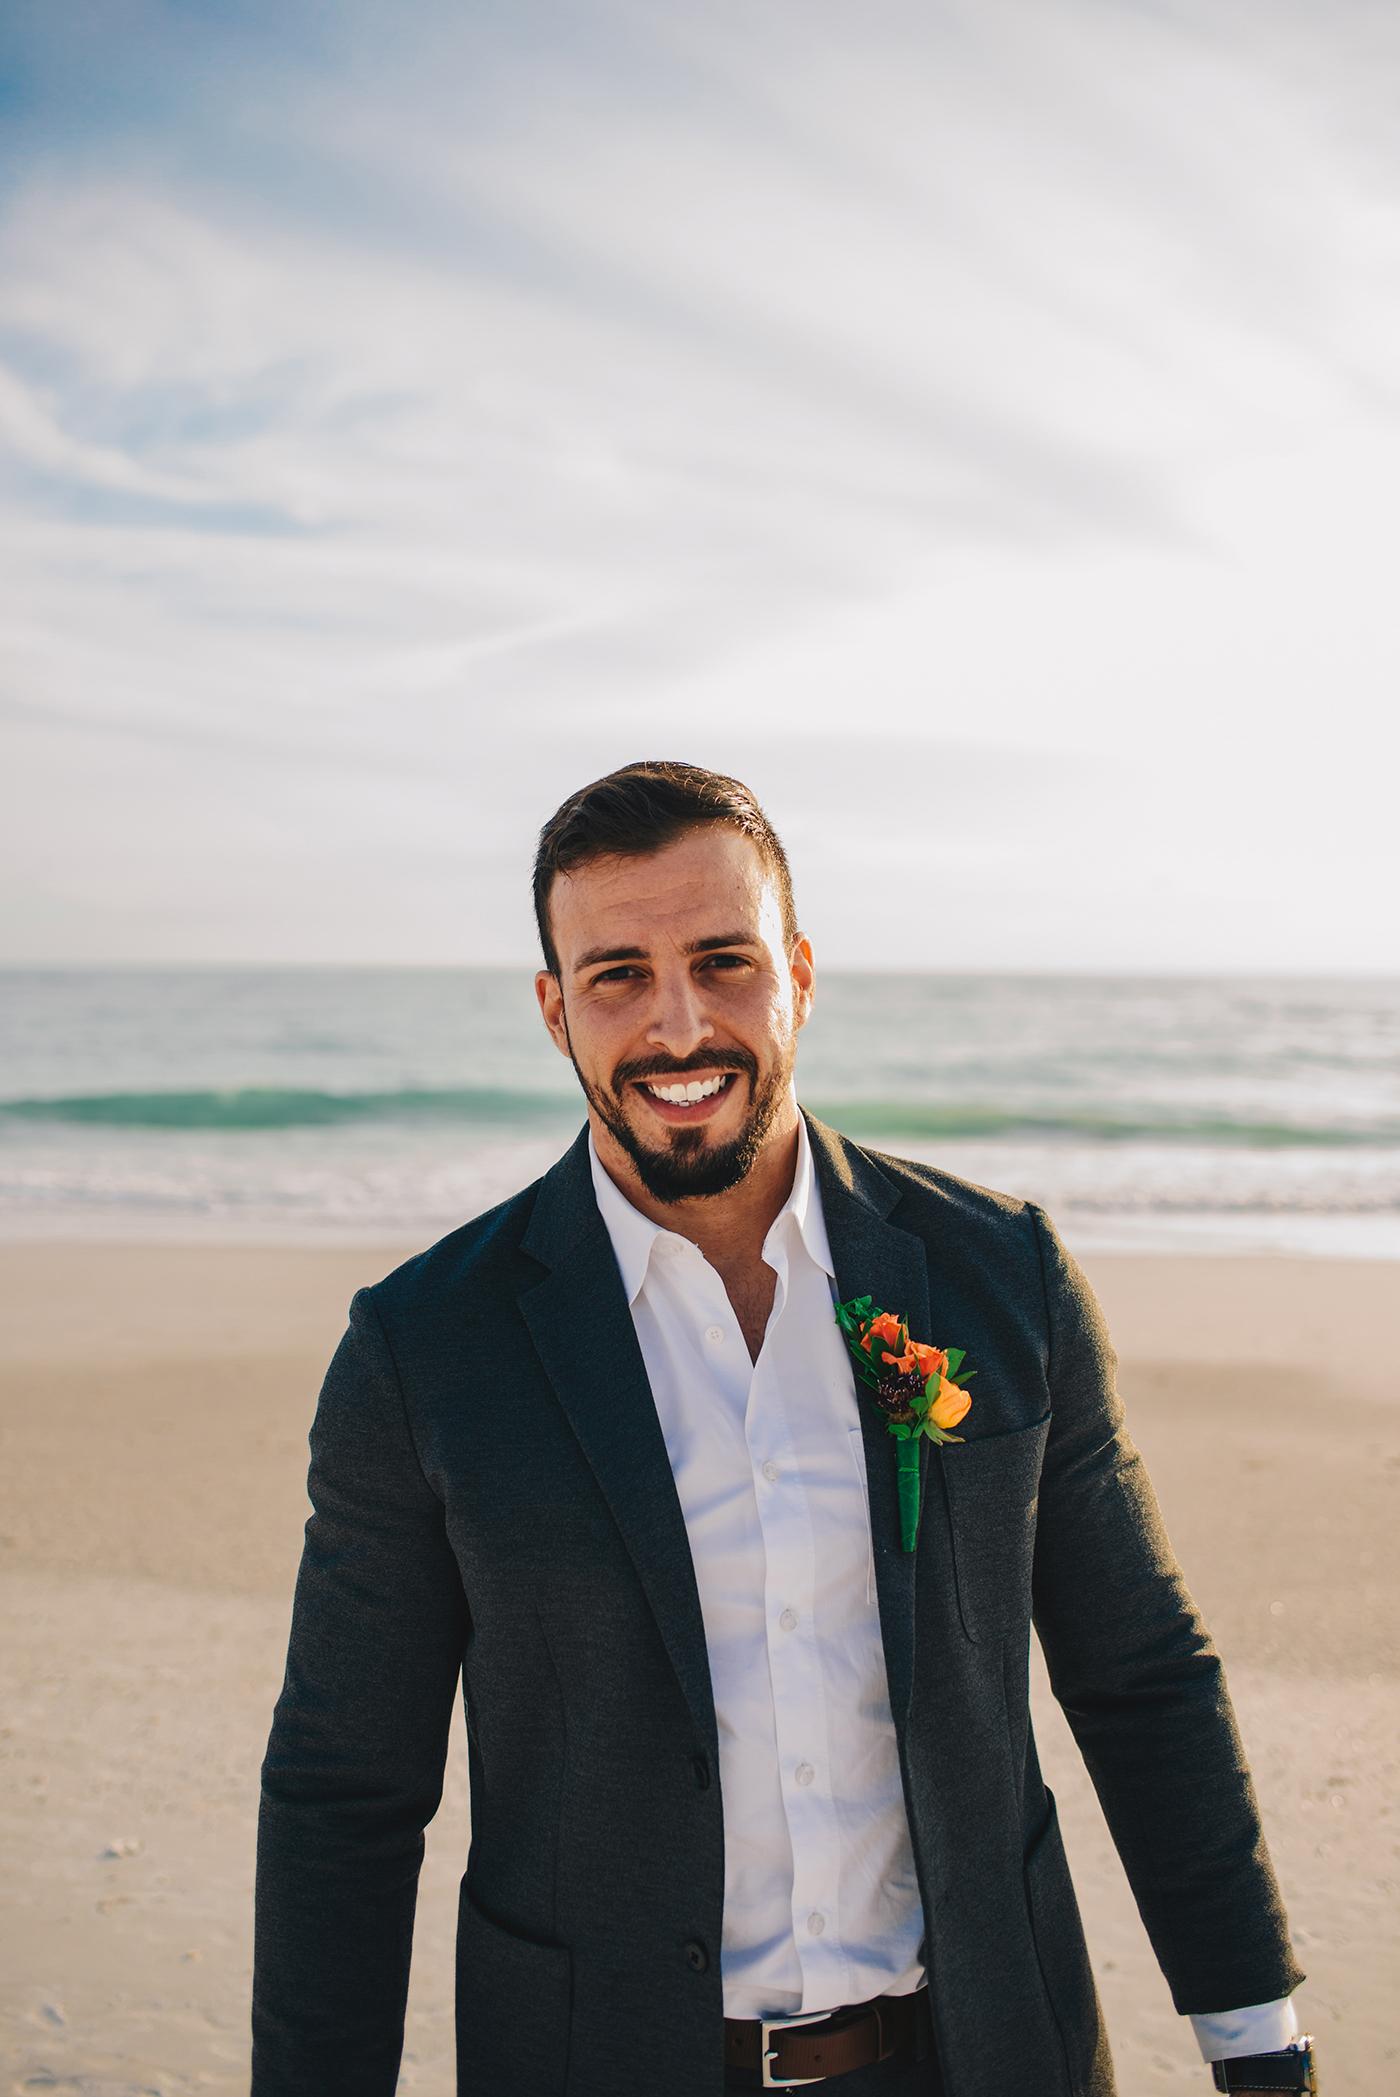 Los-Vargas-Photo-Moana-Wedding-Style-shoot-43.jpg